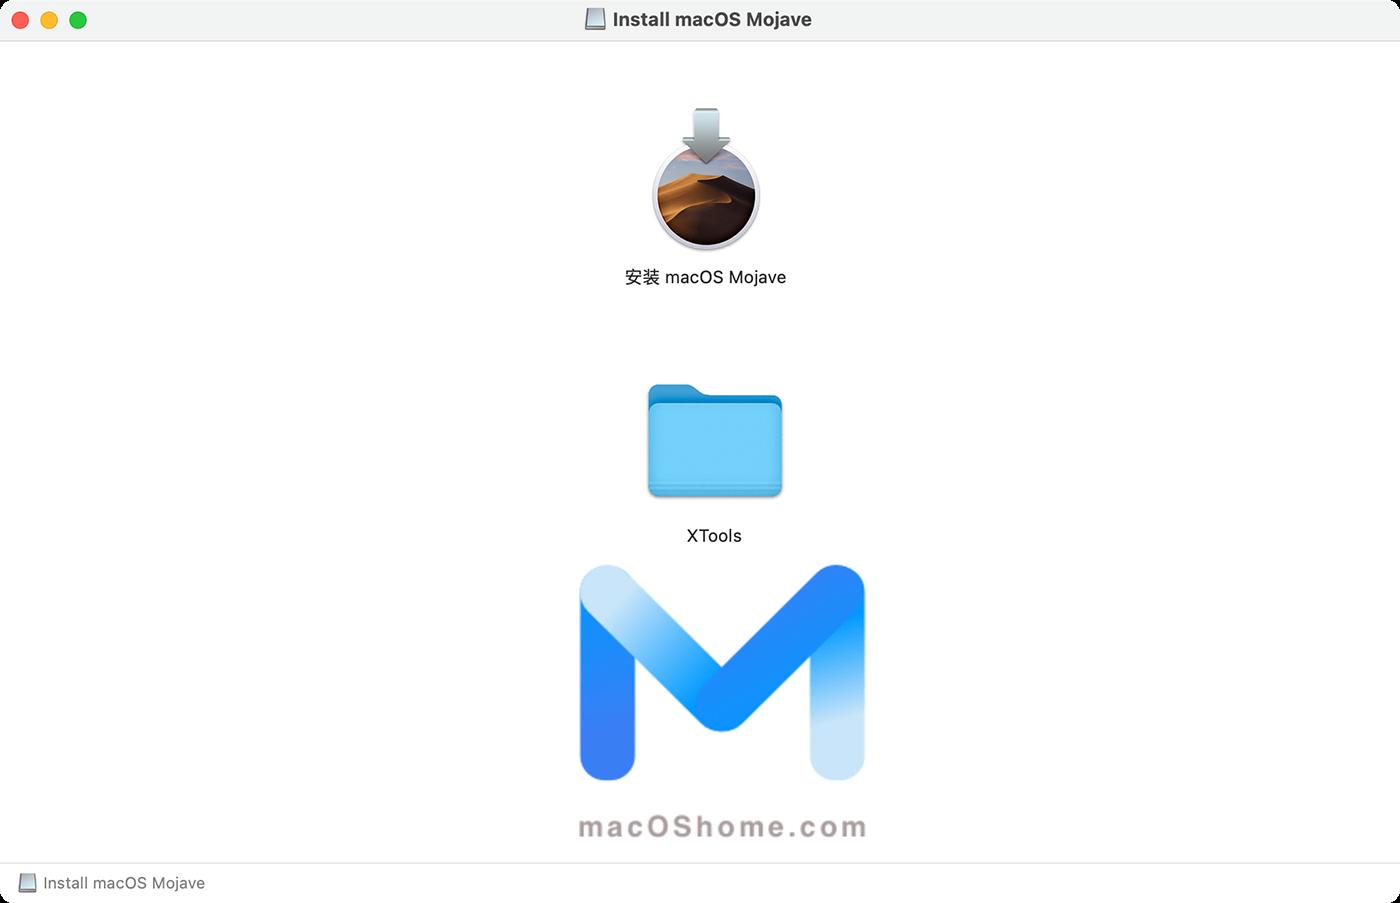 macOS Mojave 10.14.6(18G87) 带PE黑苹果原版安装镜像[装机人必备]